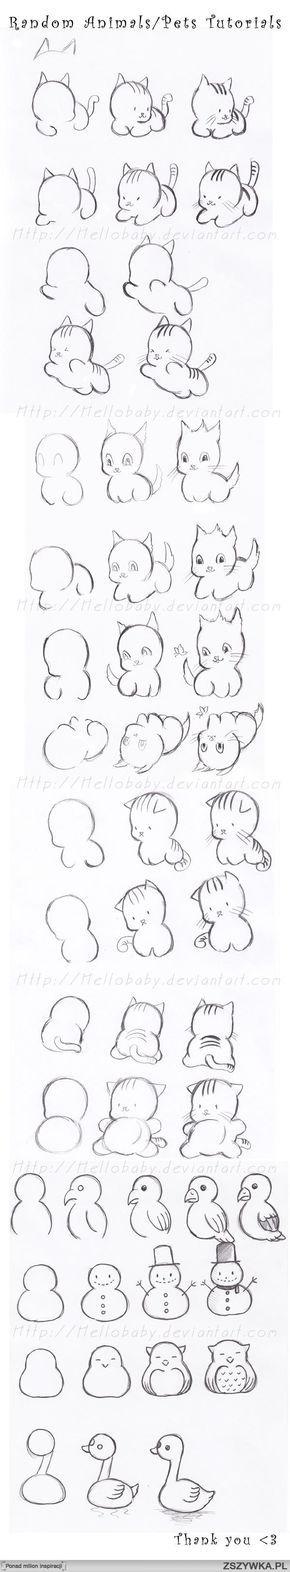 Simple draw tutorials